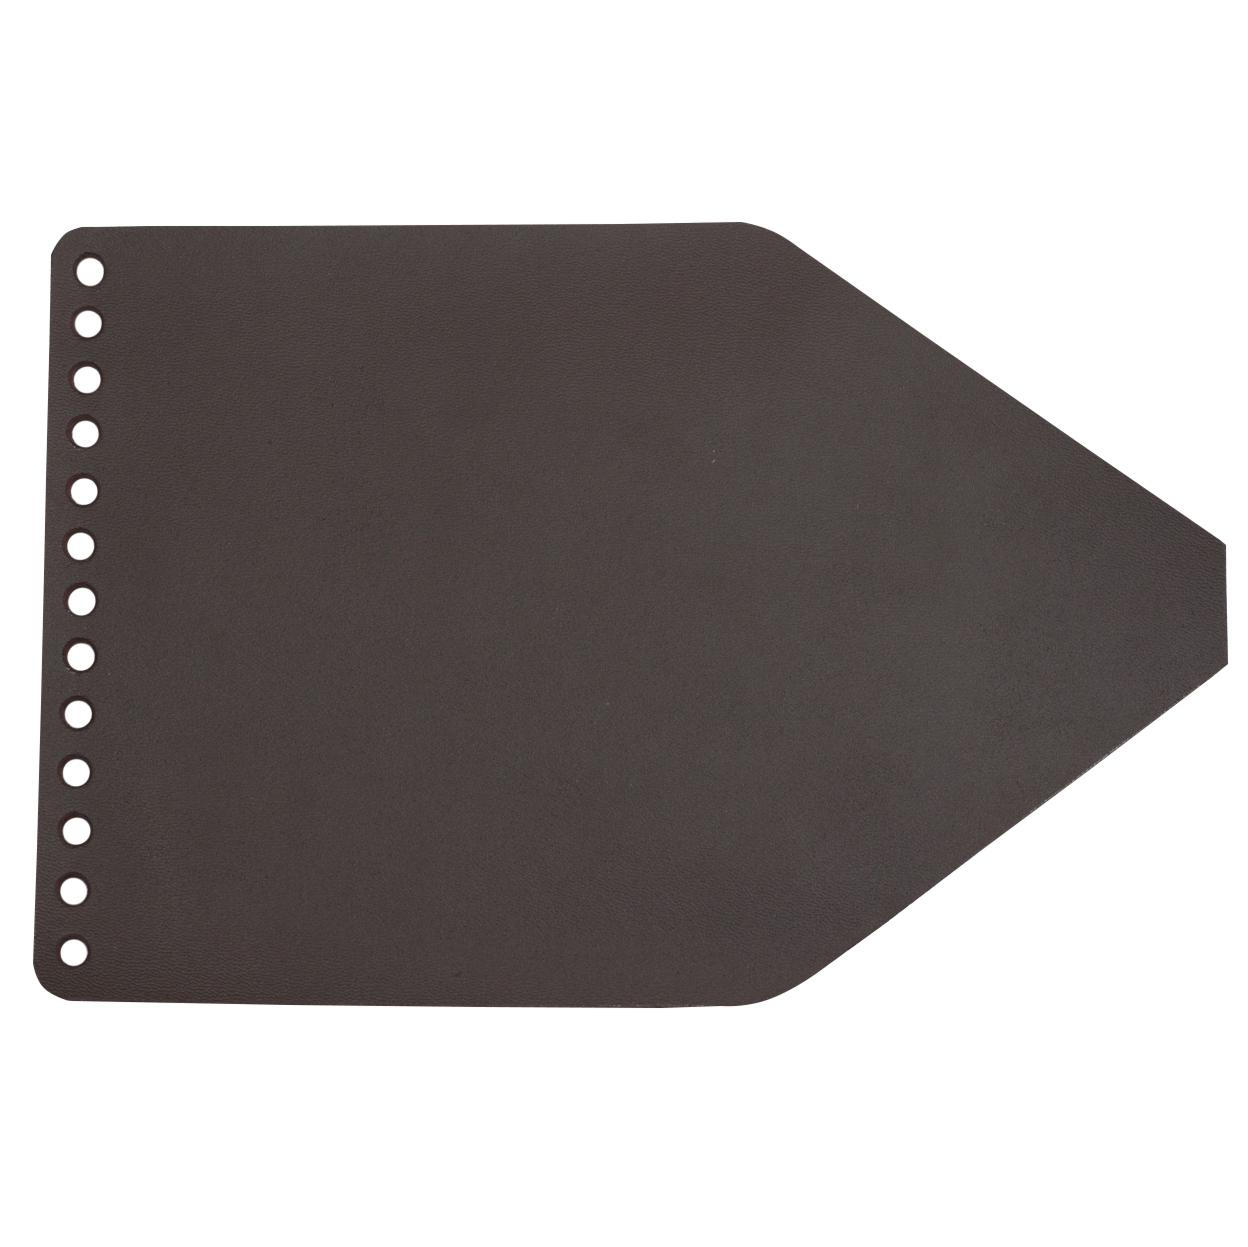 Кожаная фурнитура Клапан для рюкзачка кожаный Темно-коричневый 1,6 мм IMG_9327.jpg